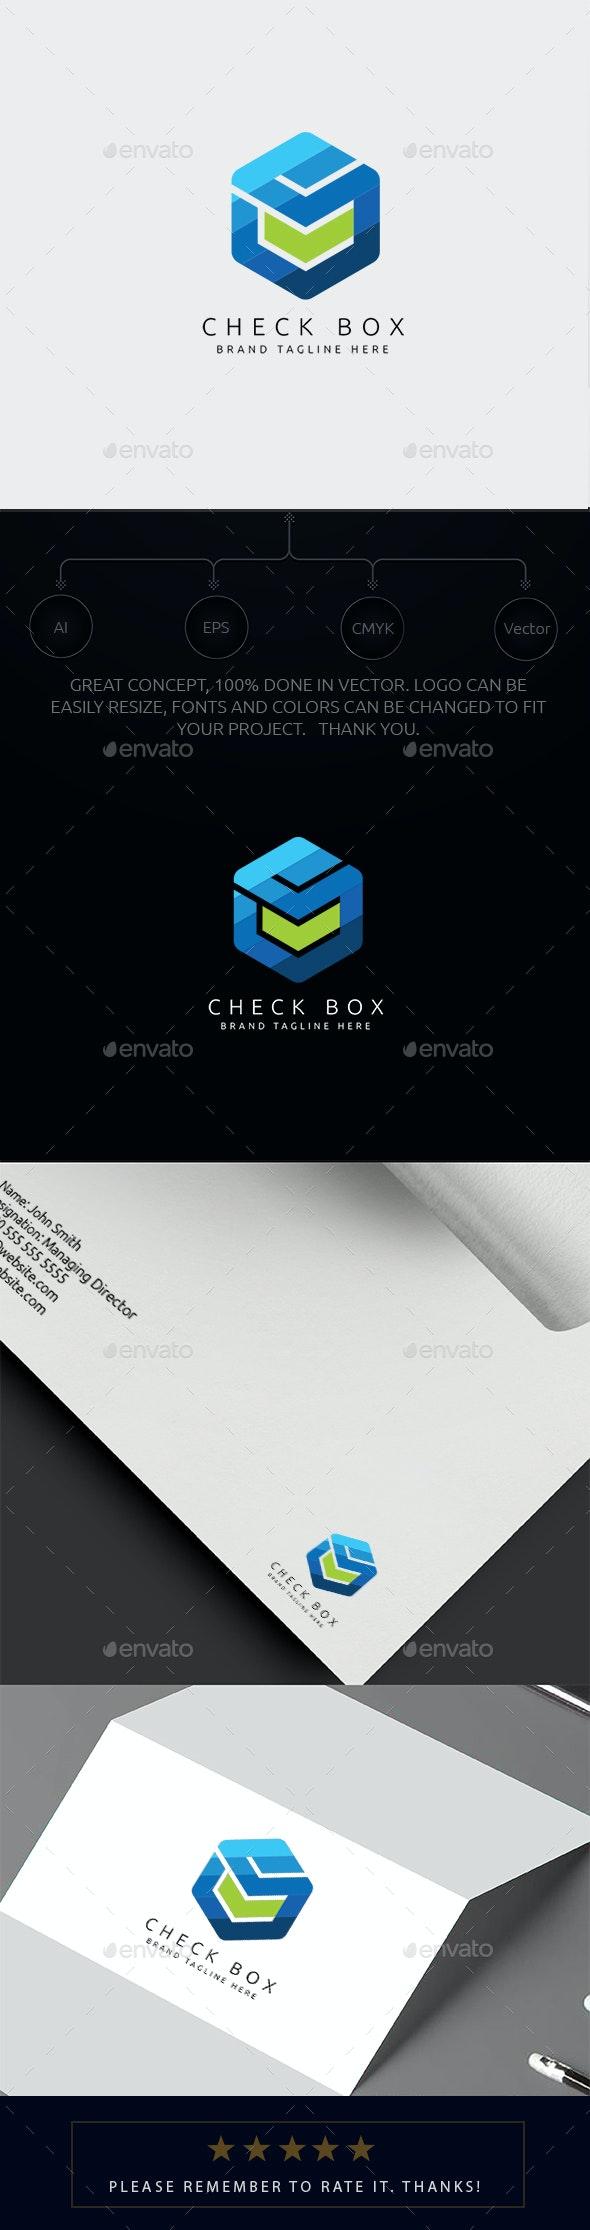 Check Box Logo - Symbols Logo Templates